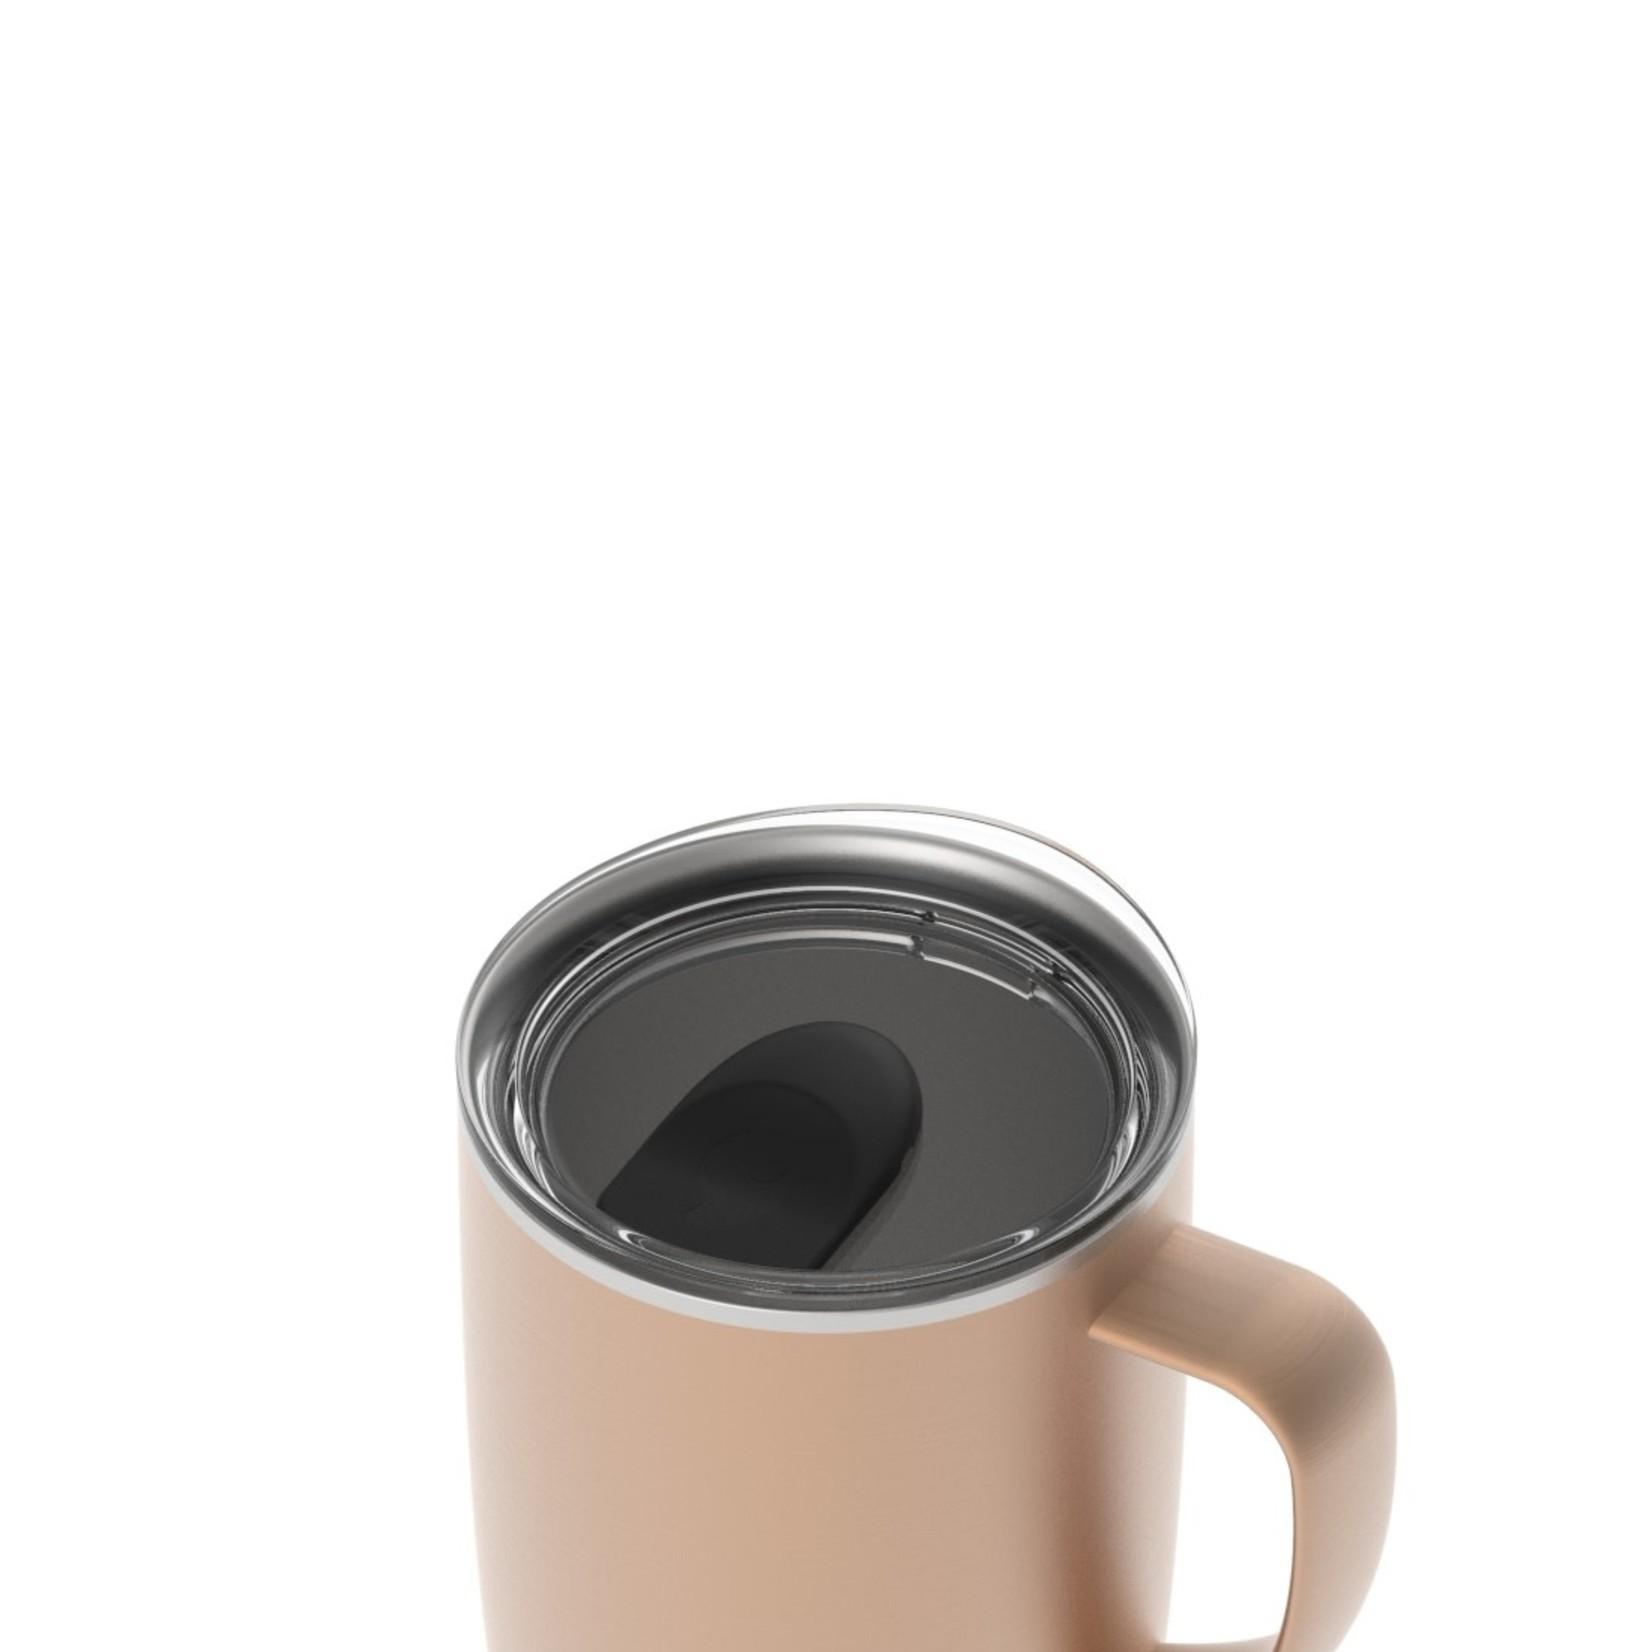 S'well S'well Bottle 16oz Tumbler Mug with Handle/Lid Pyrite